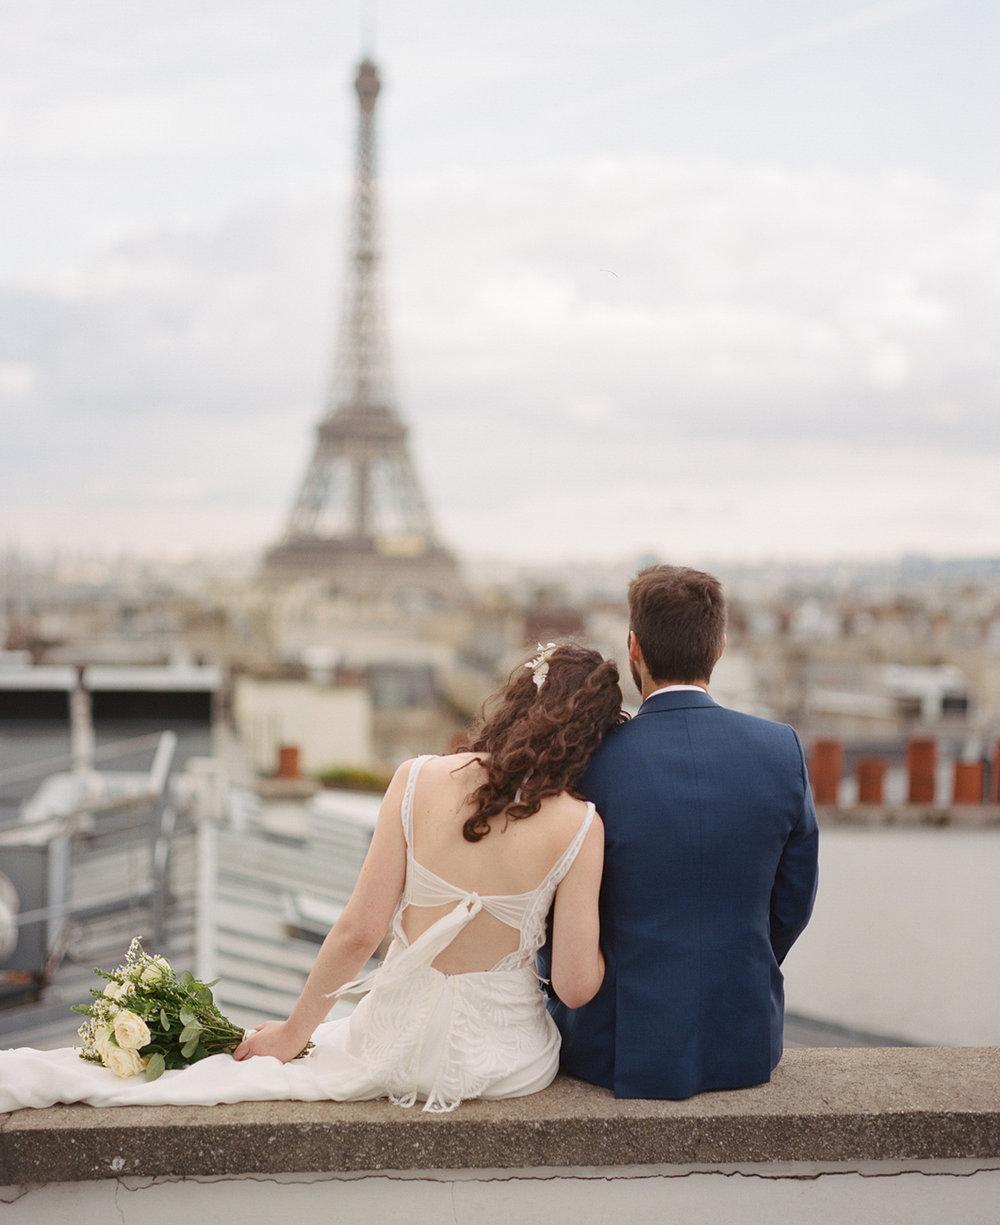 toits-paris-mariage-photographe-1.jpg